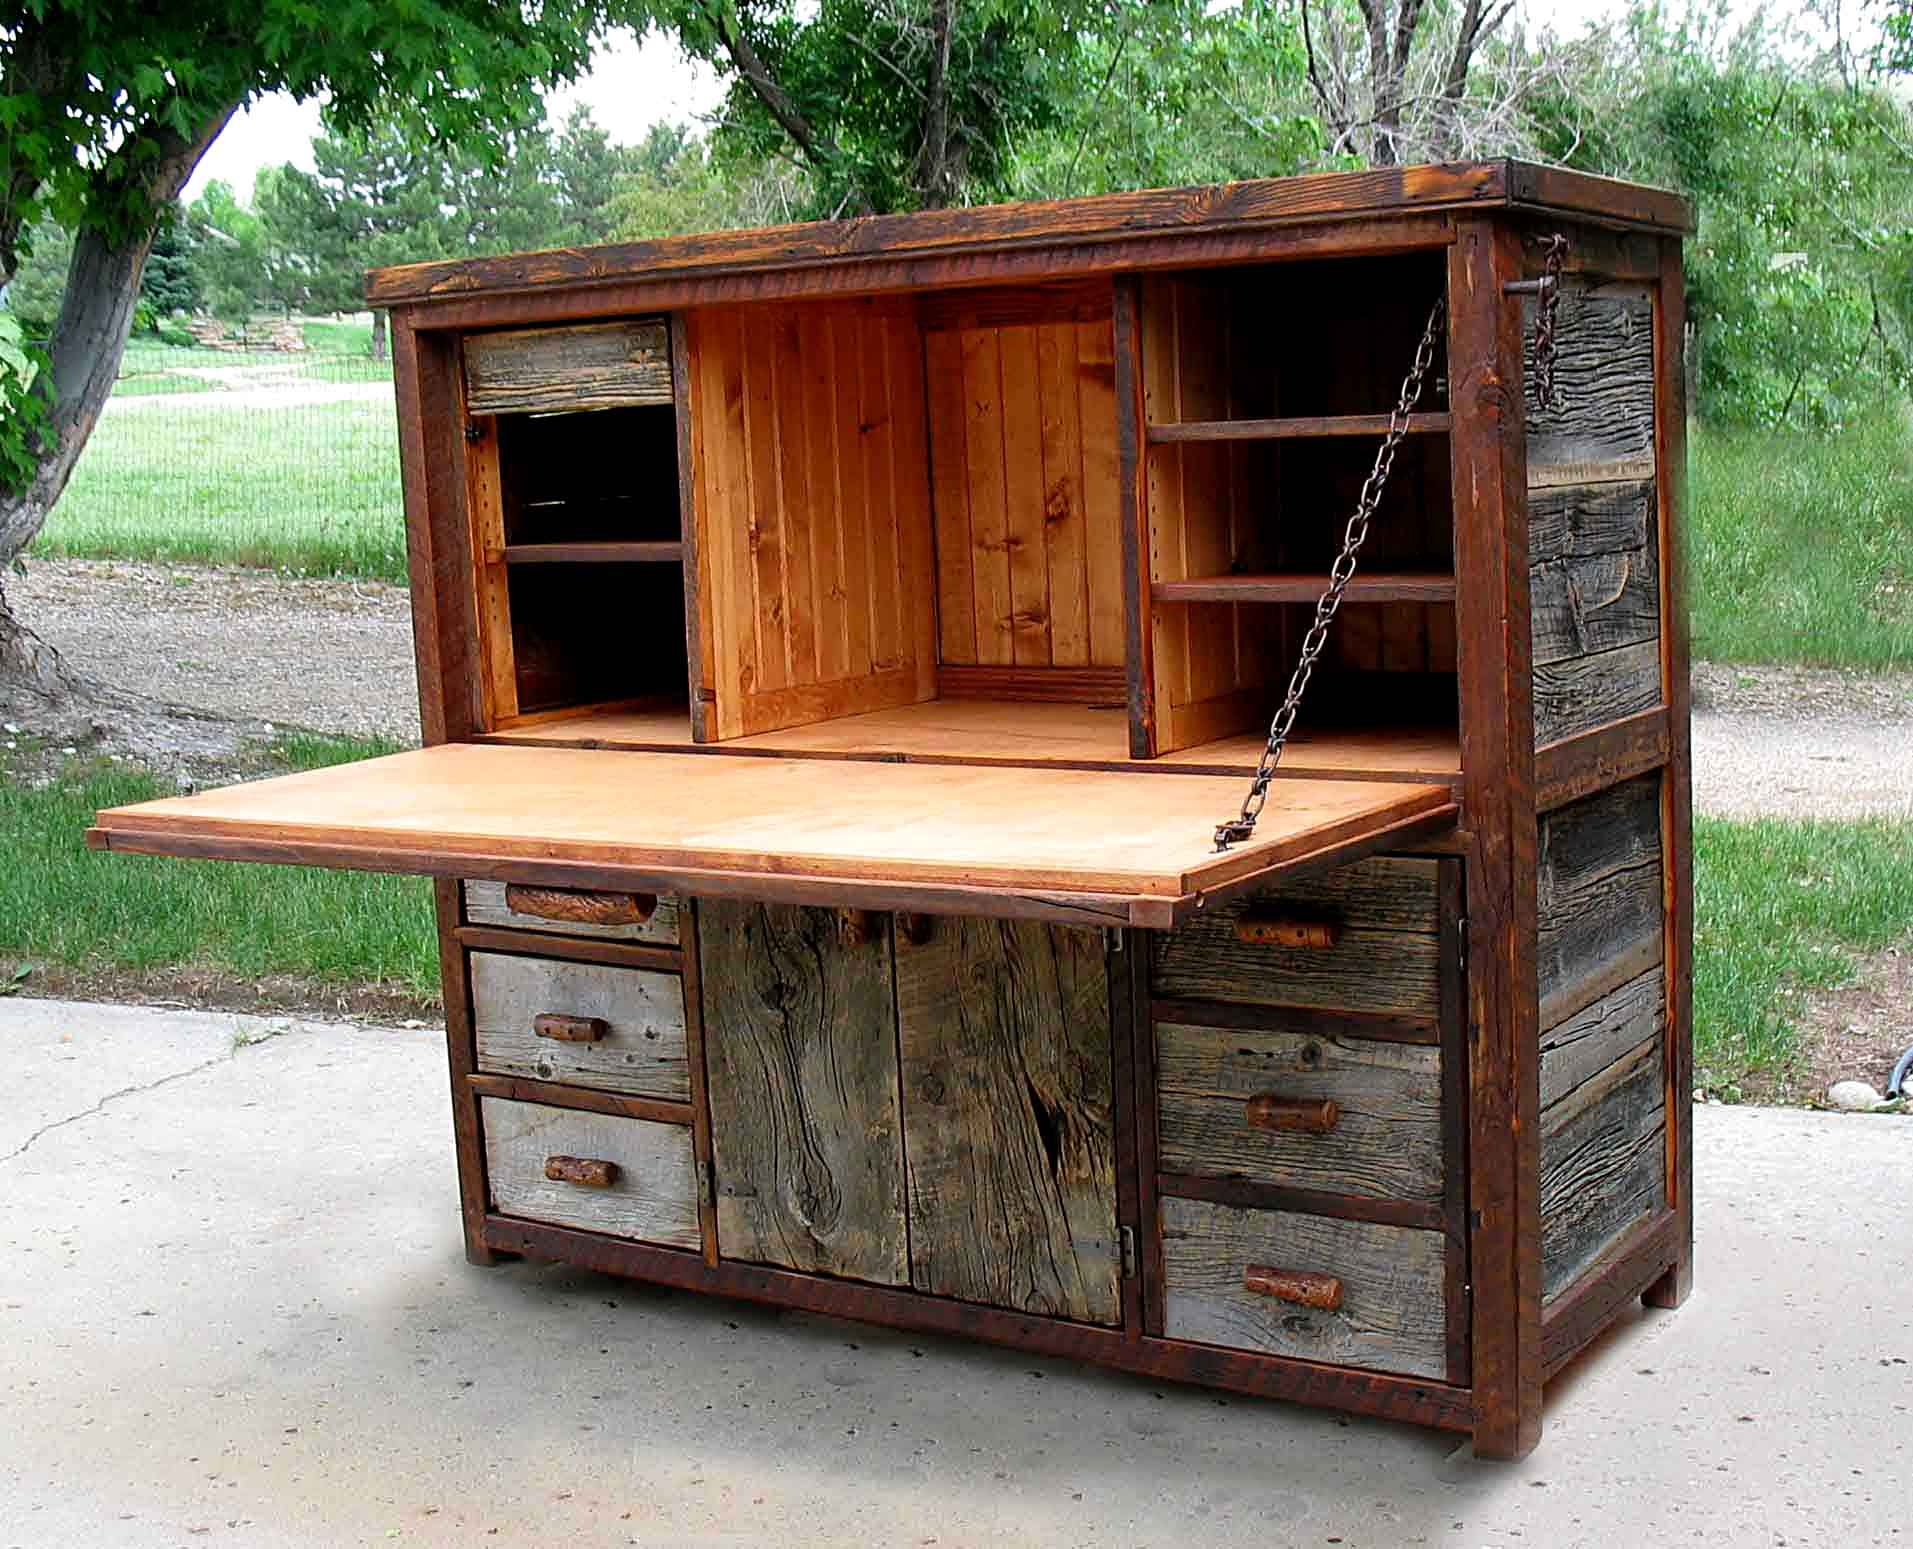 Rustic Barnwood Desks - Computer Fold And Seven